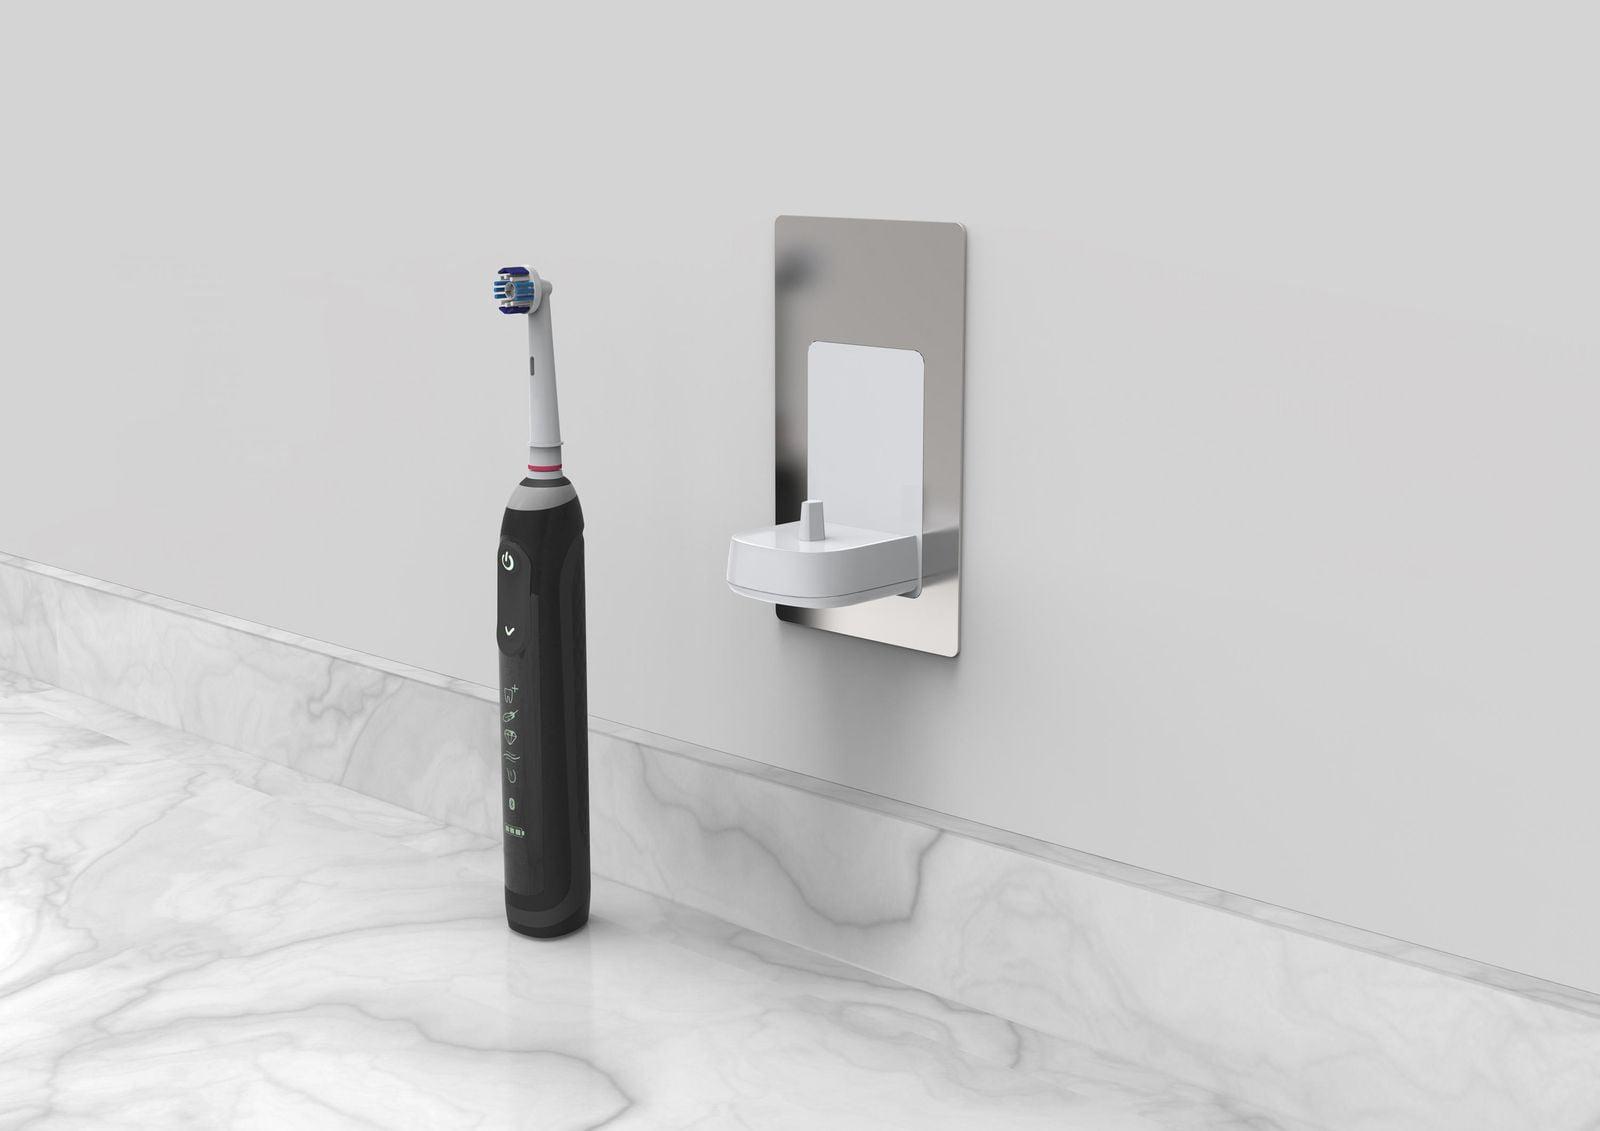 spazzolino elettrico Oral-B gratis